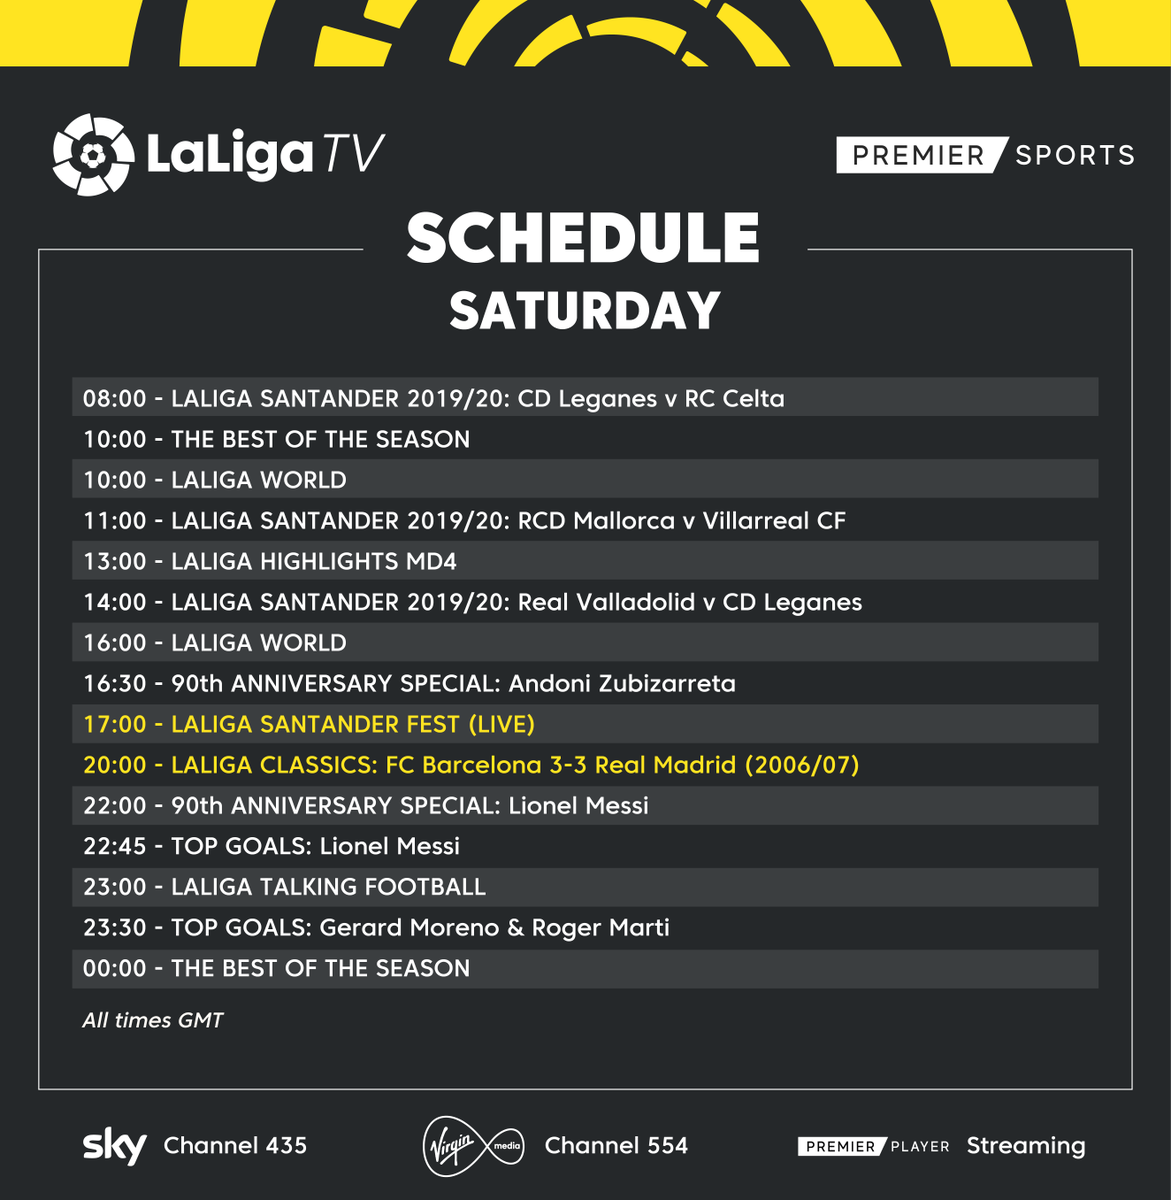 📅 𝗦𝗔𝗧𝗨𝗥𝗗𝗔𝗬 𝗦𝗖𝗛𝗘𝗗𝗨𝗟𝗘 📺 Watch #LaLigaSantanderFest LIVE at 5pm today on #LaLigaTV! 🏡 #StayAtHome